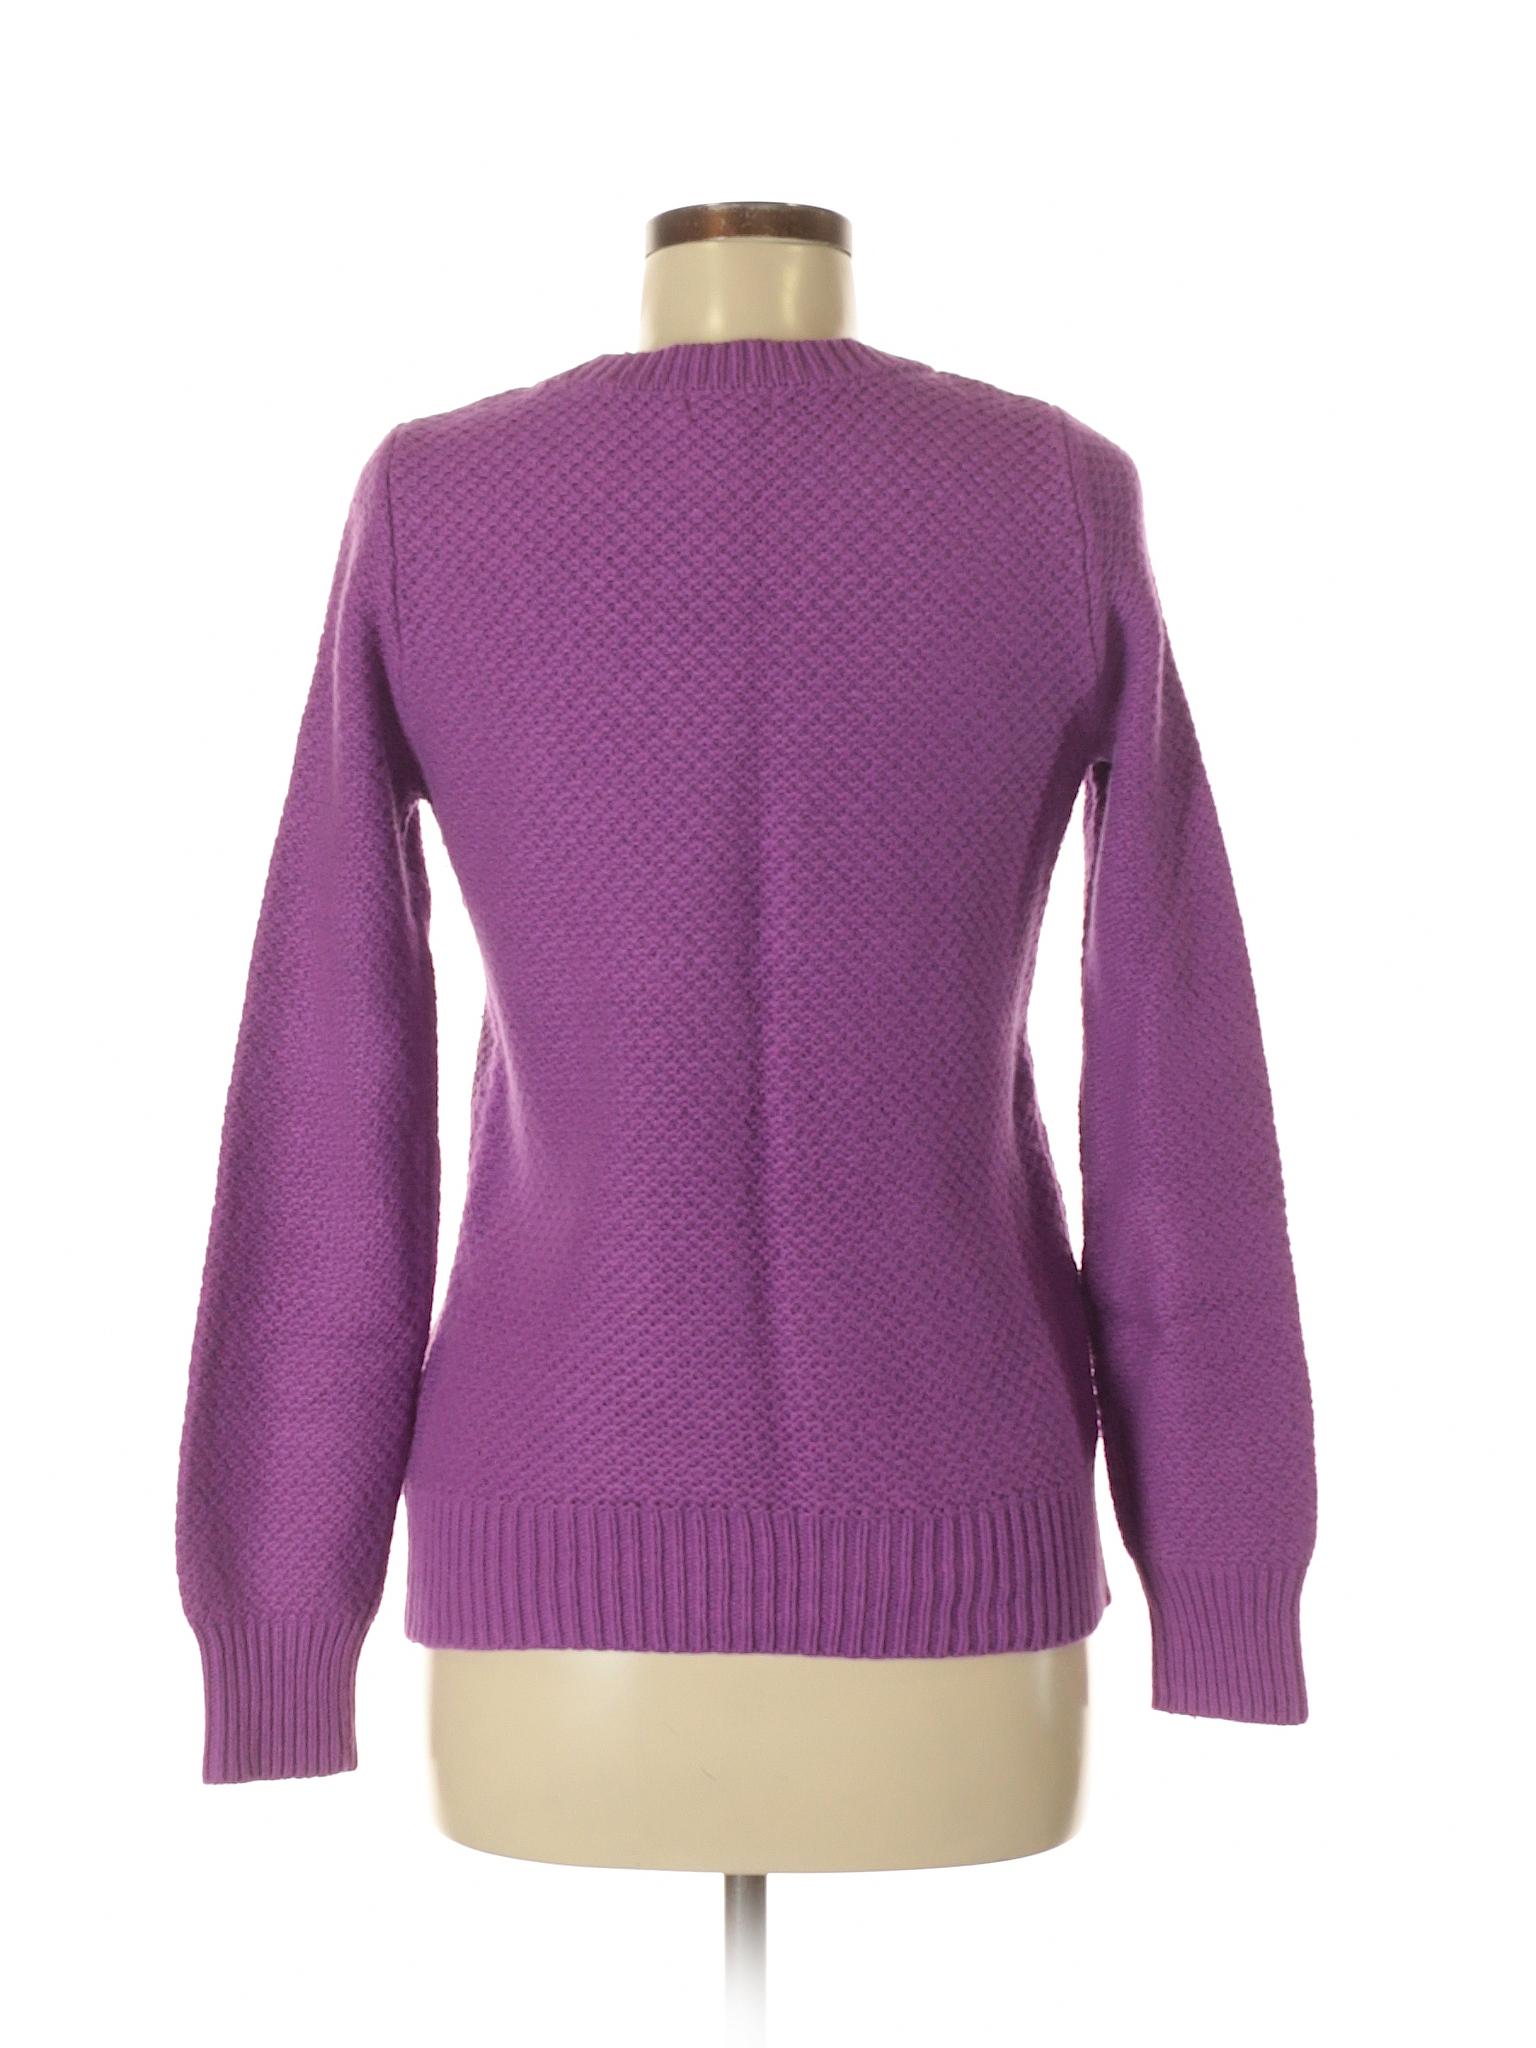 Boutique winter Merona Pullover Pullover Merona winter Sweater Boutique zxfwqxU